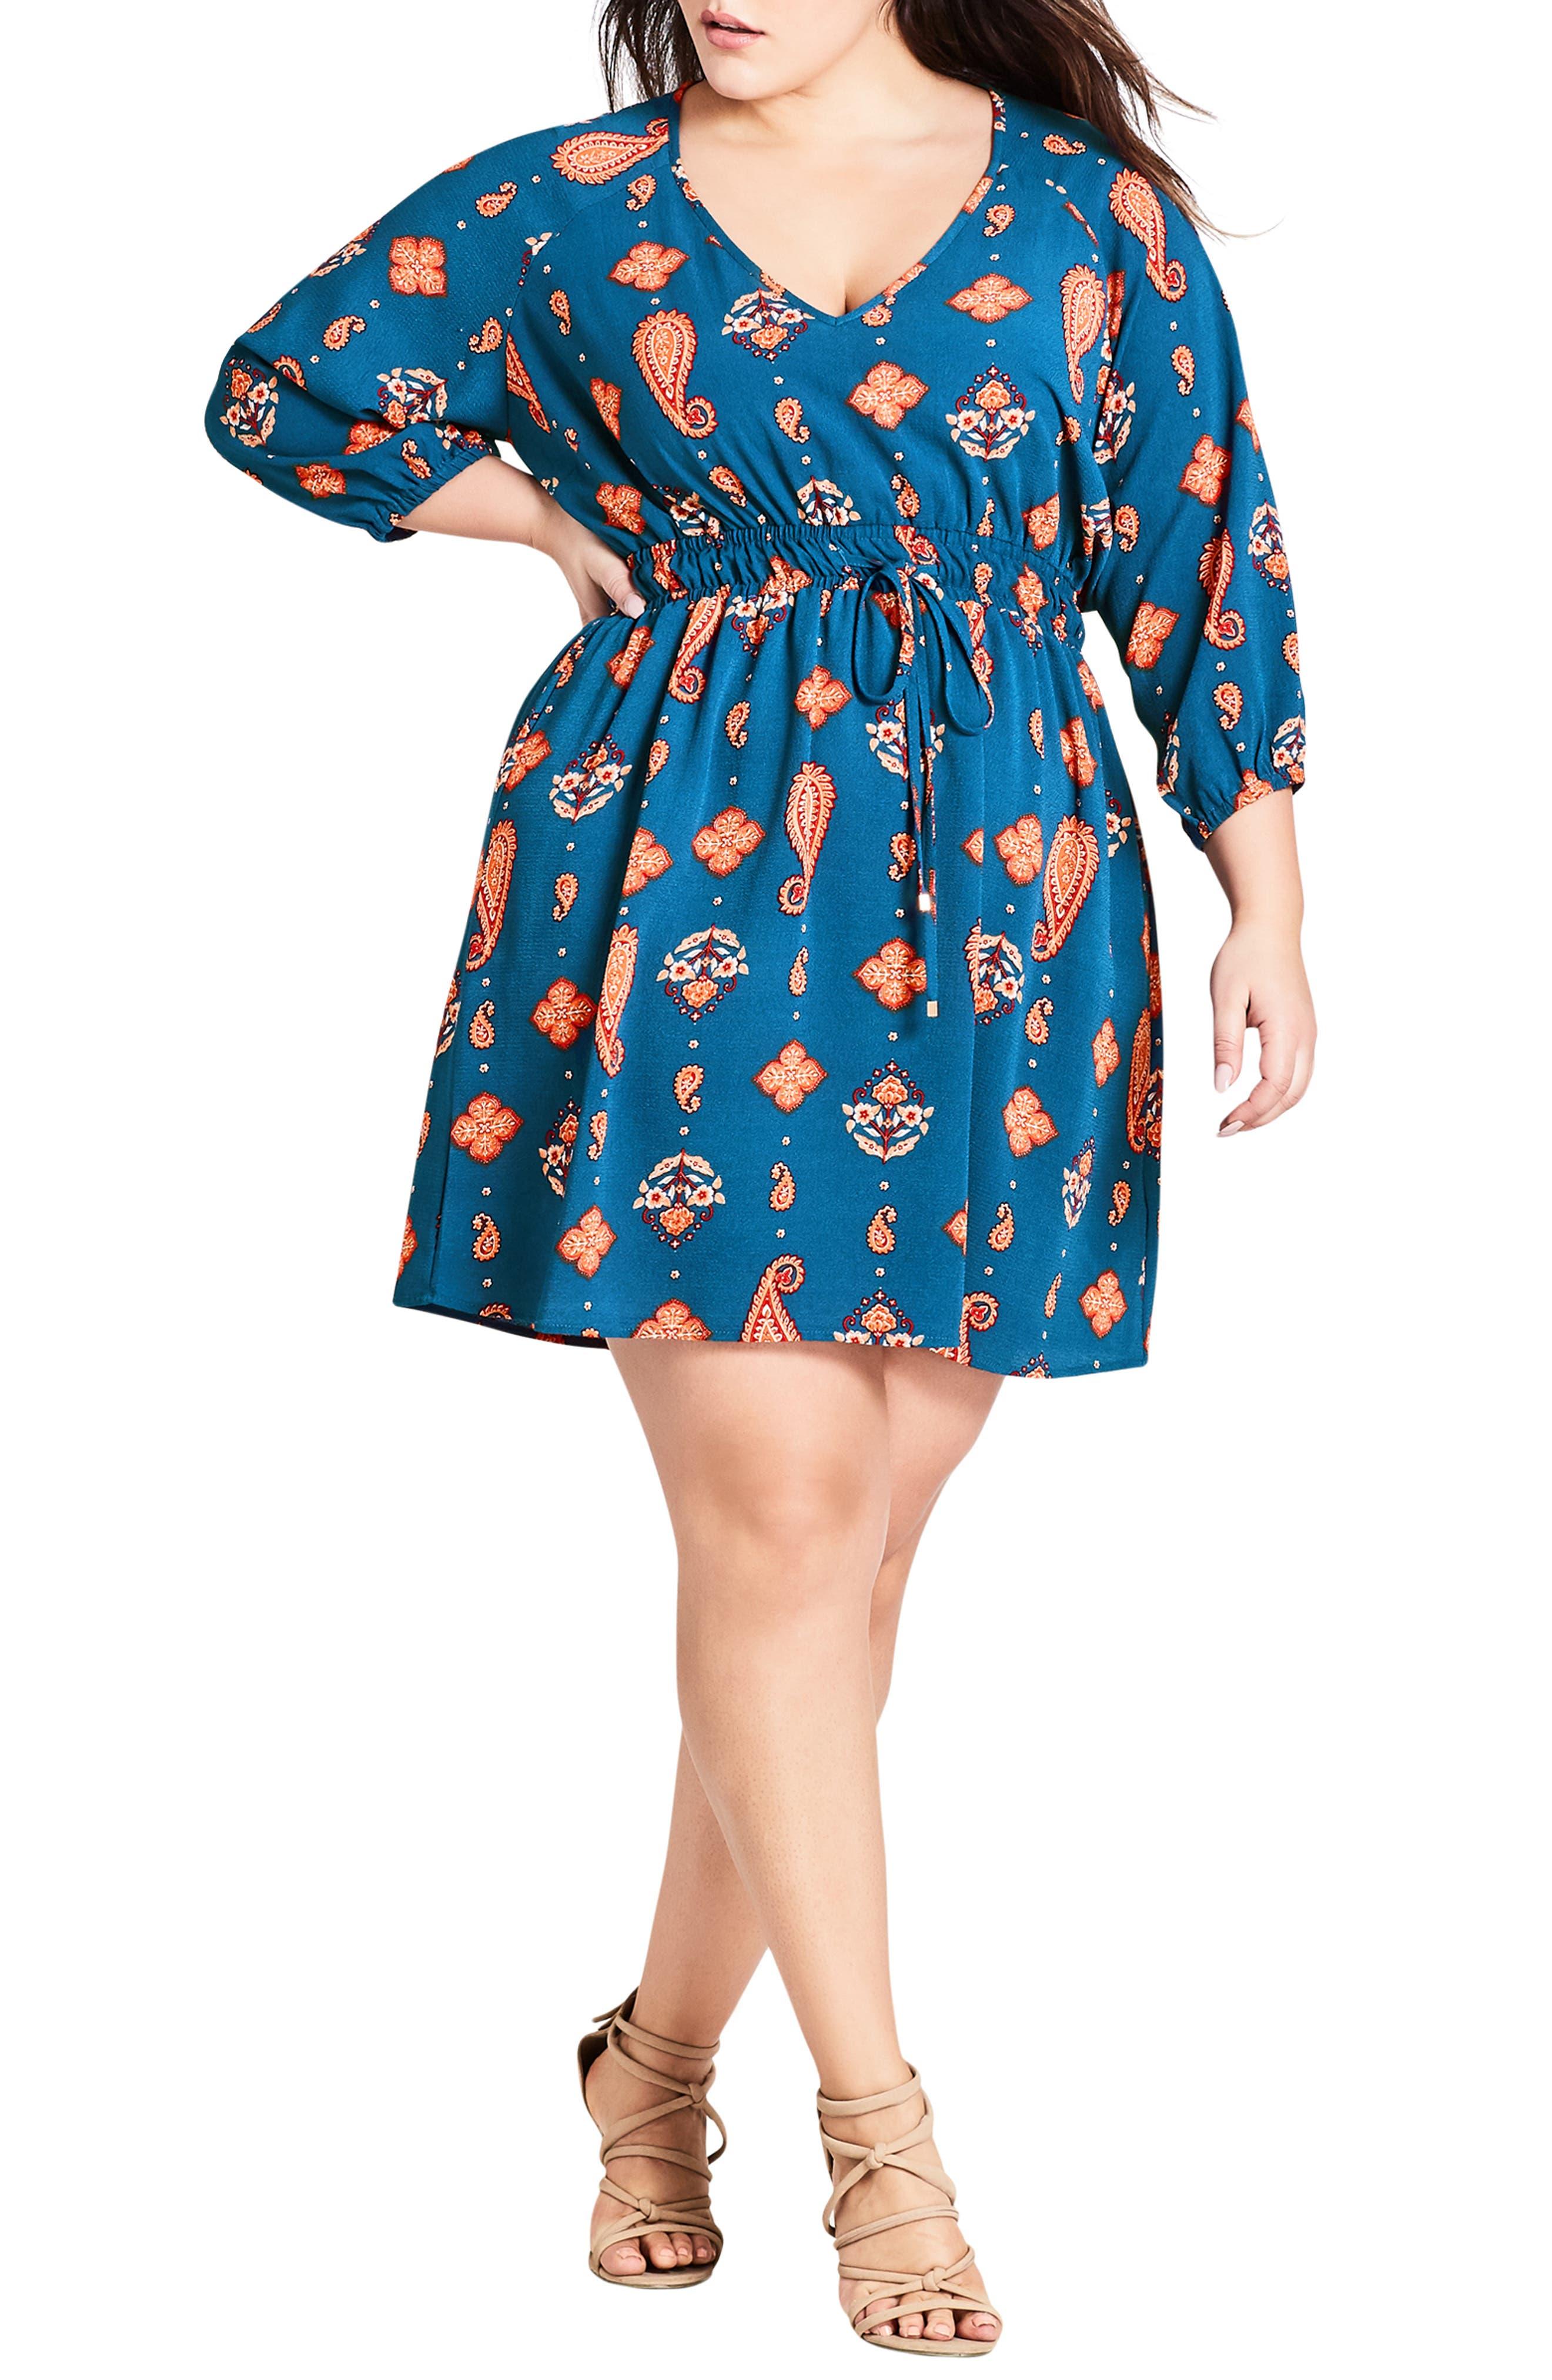 Plus Size City Chic Free Spirit Drawstring Waist Dress, Blue